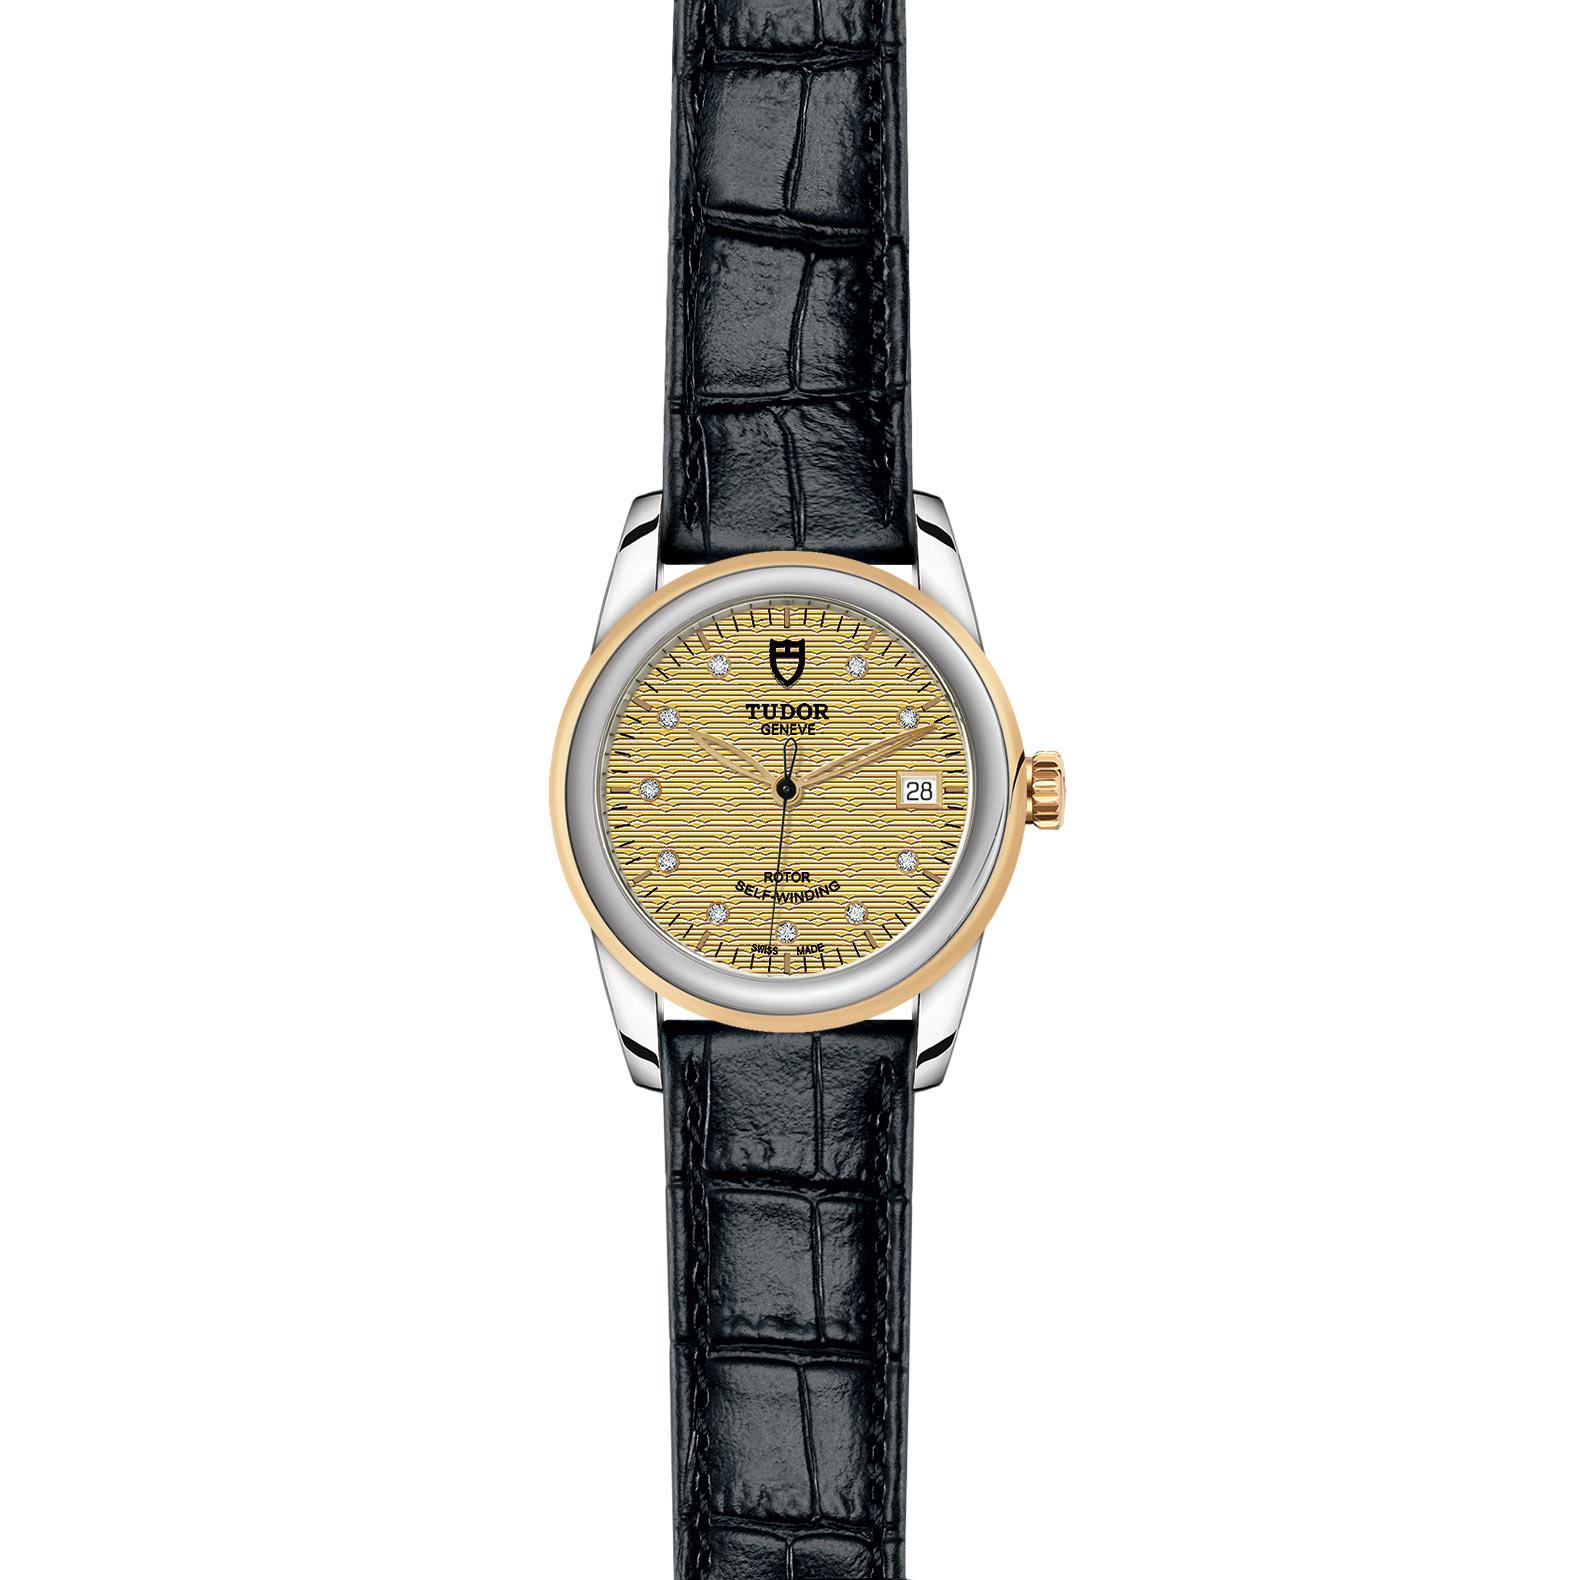 TUDOR Glamour Date M55003 0068 Frontfacing